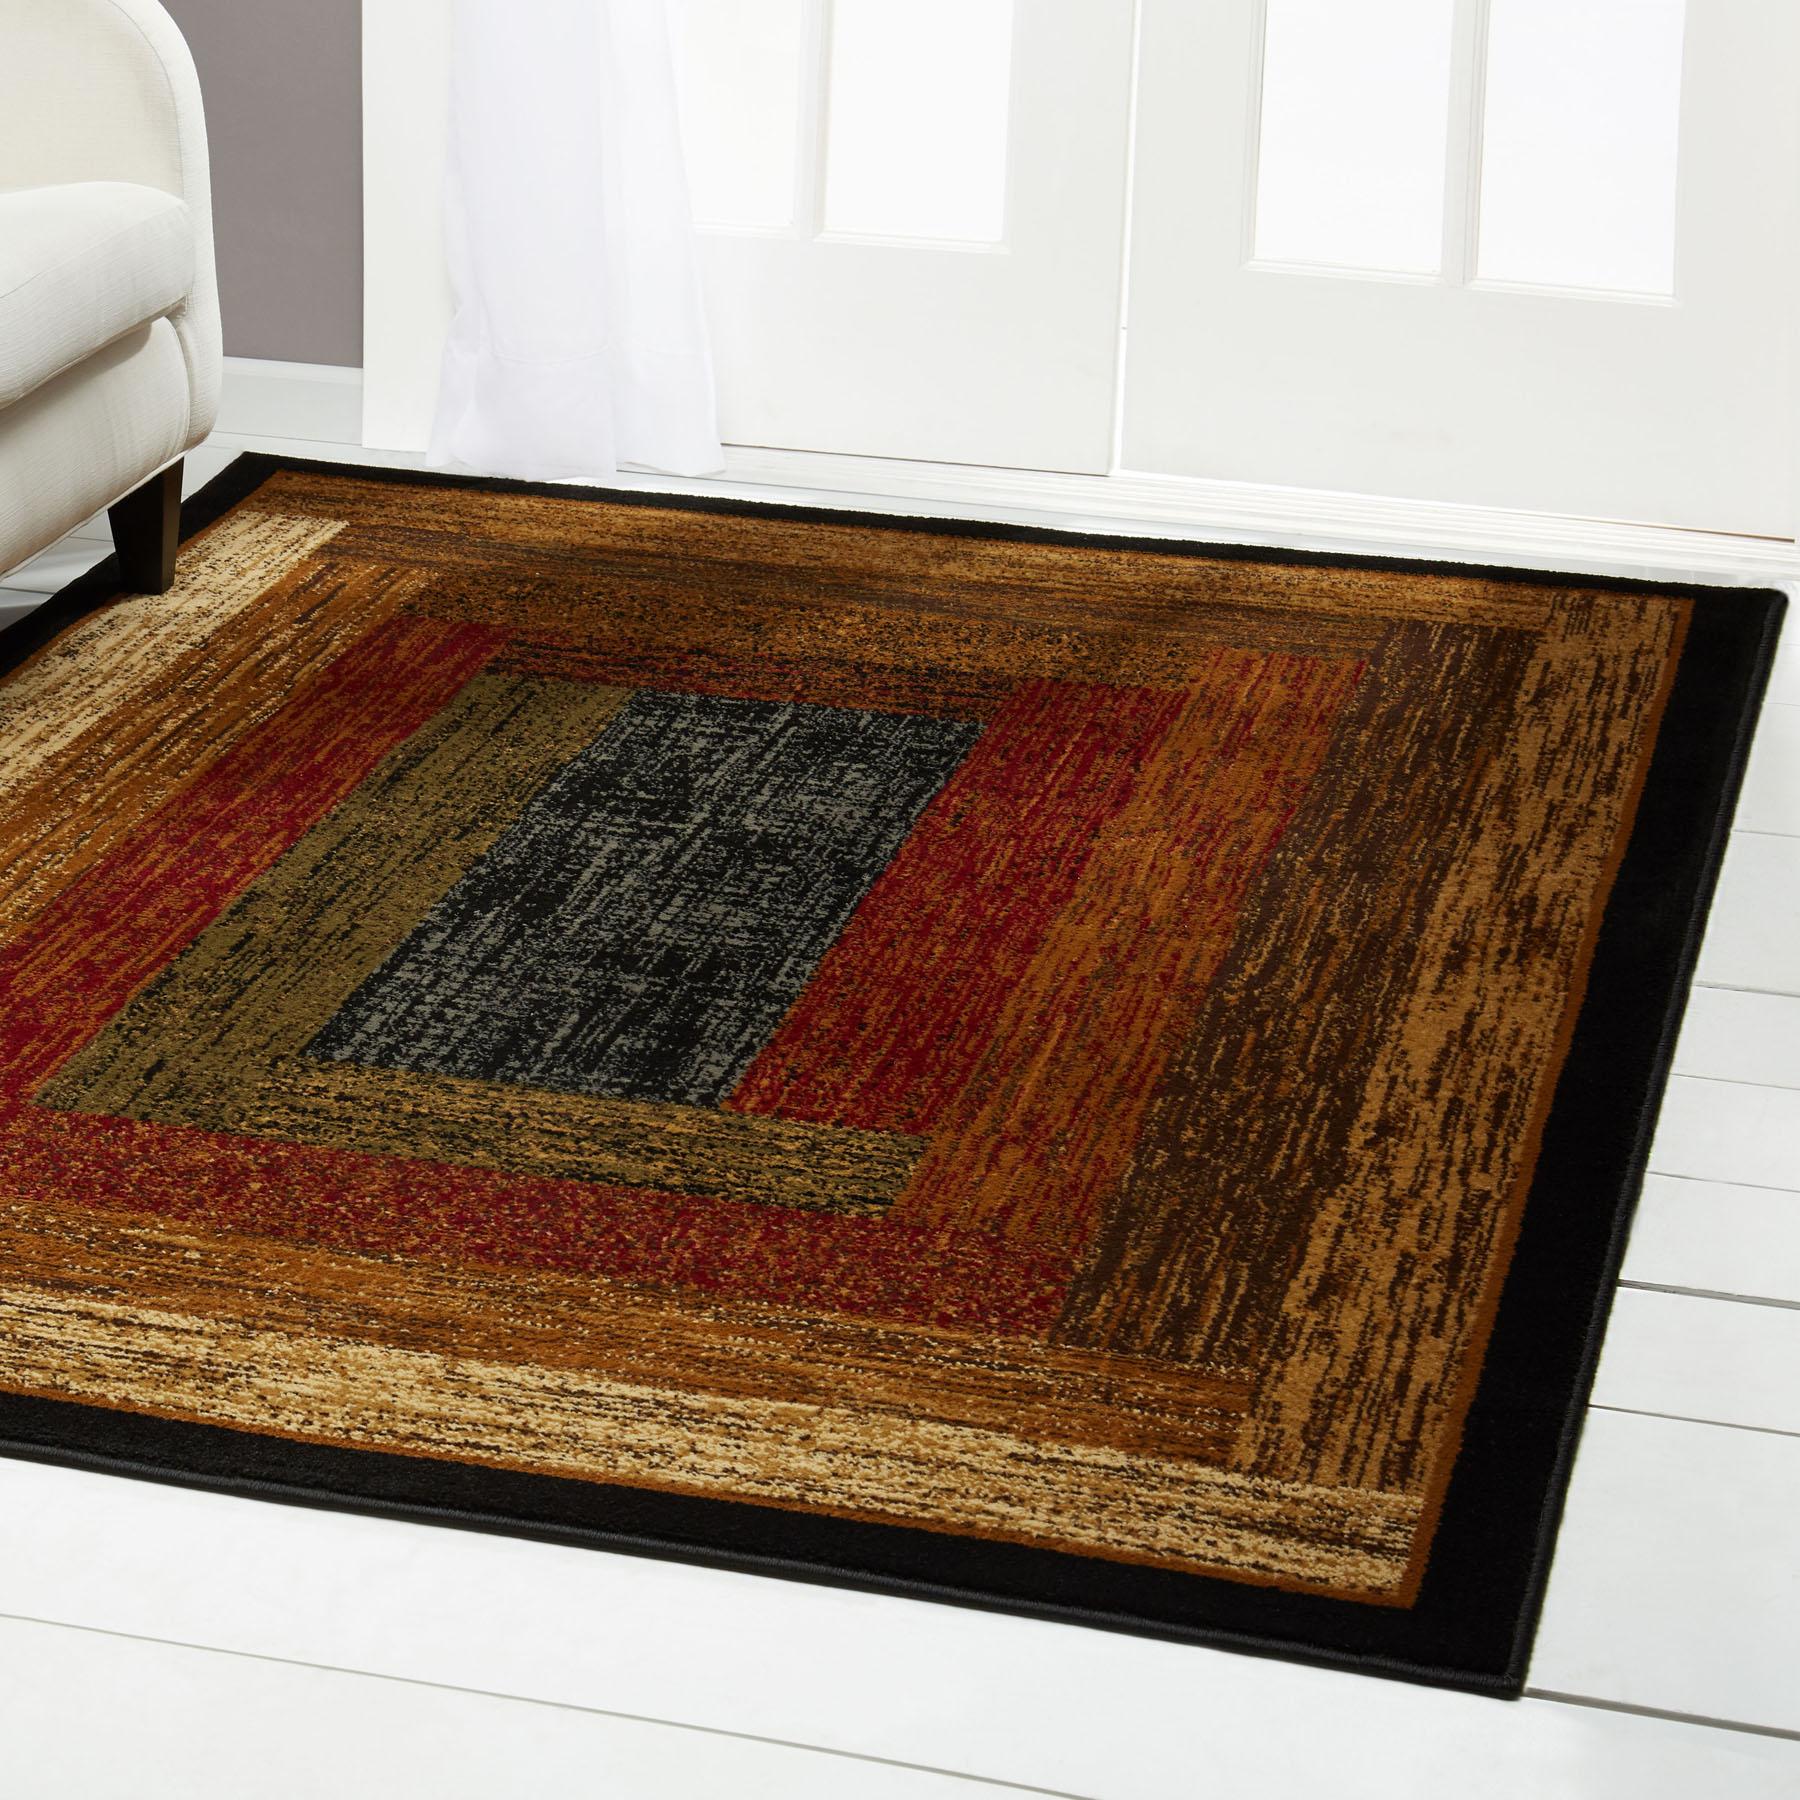 Red Green Beige Tan Bordered Modern Geometric Area Rug Contemporary Carpet Ebay